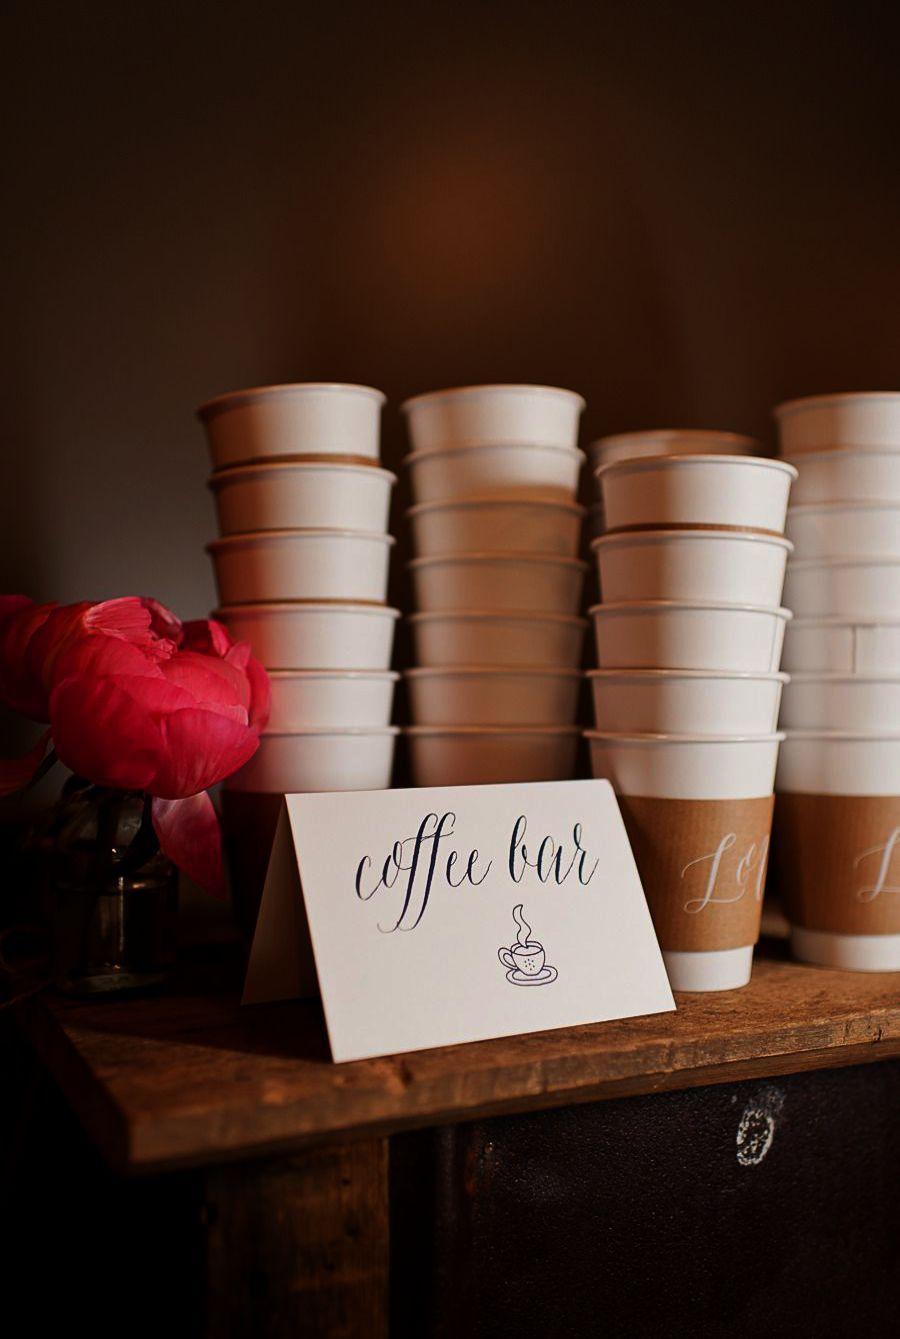 Coffee Shop Ktown The Coffee Near Me Auburn Below Coffee Meets Bagel First Message Coffee Wedding Coffee Bar Wedding Brunch Wedding